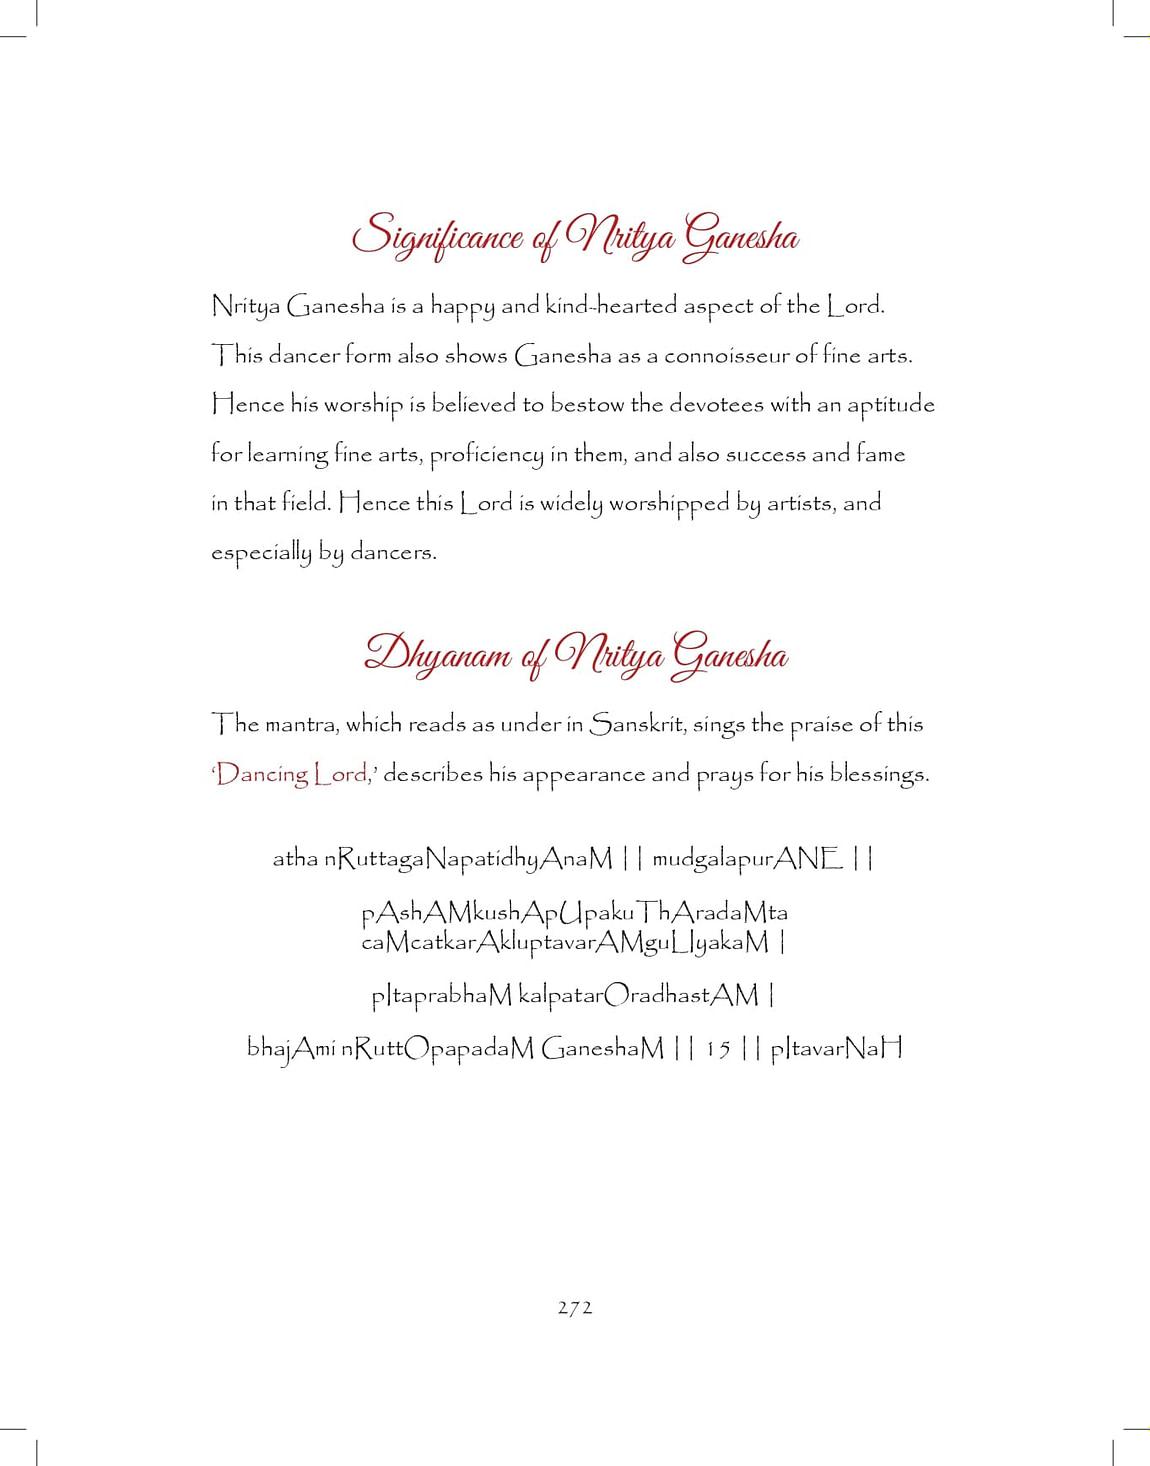 Ganesh-print_pages-to-jpg-0272.jpg